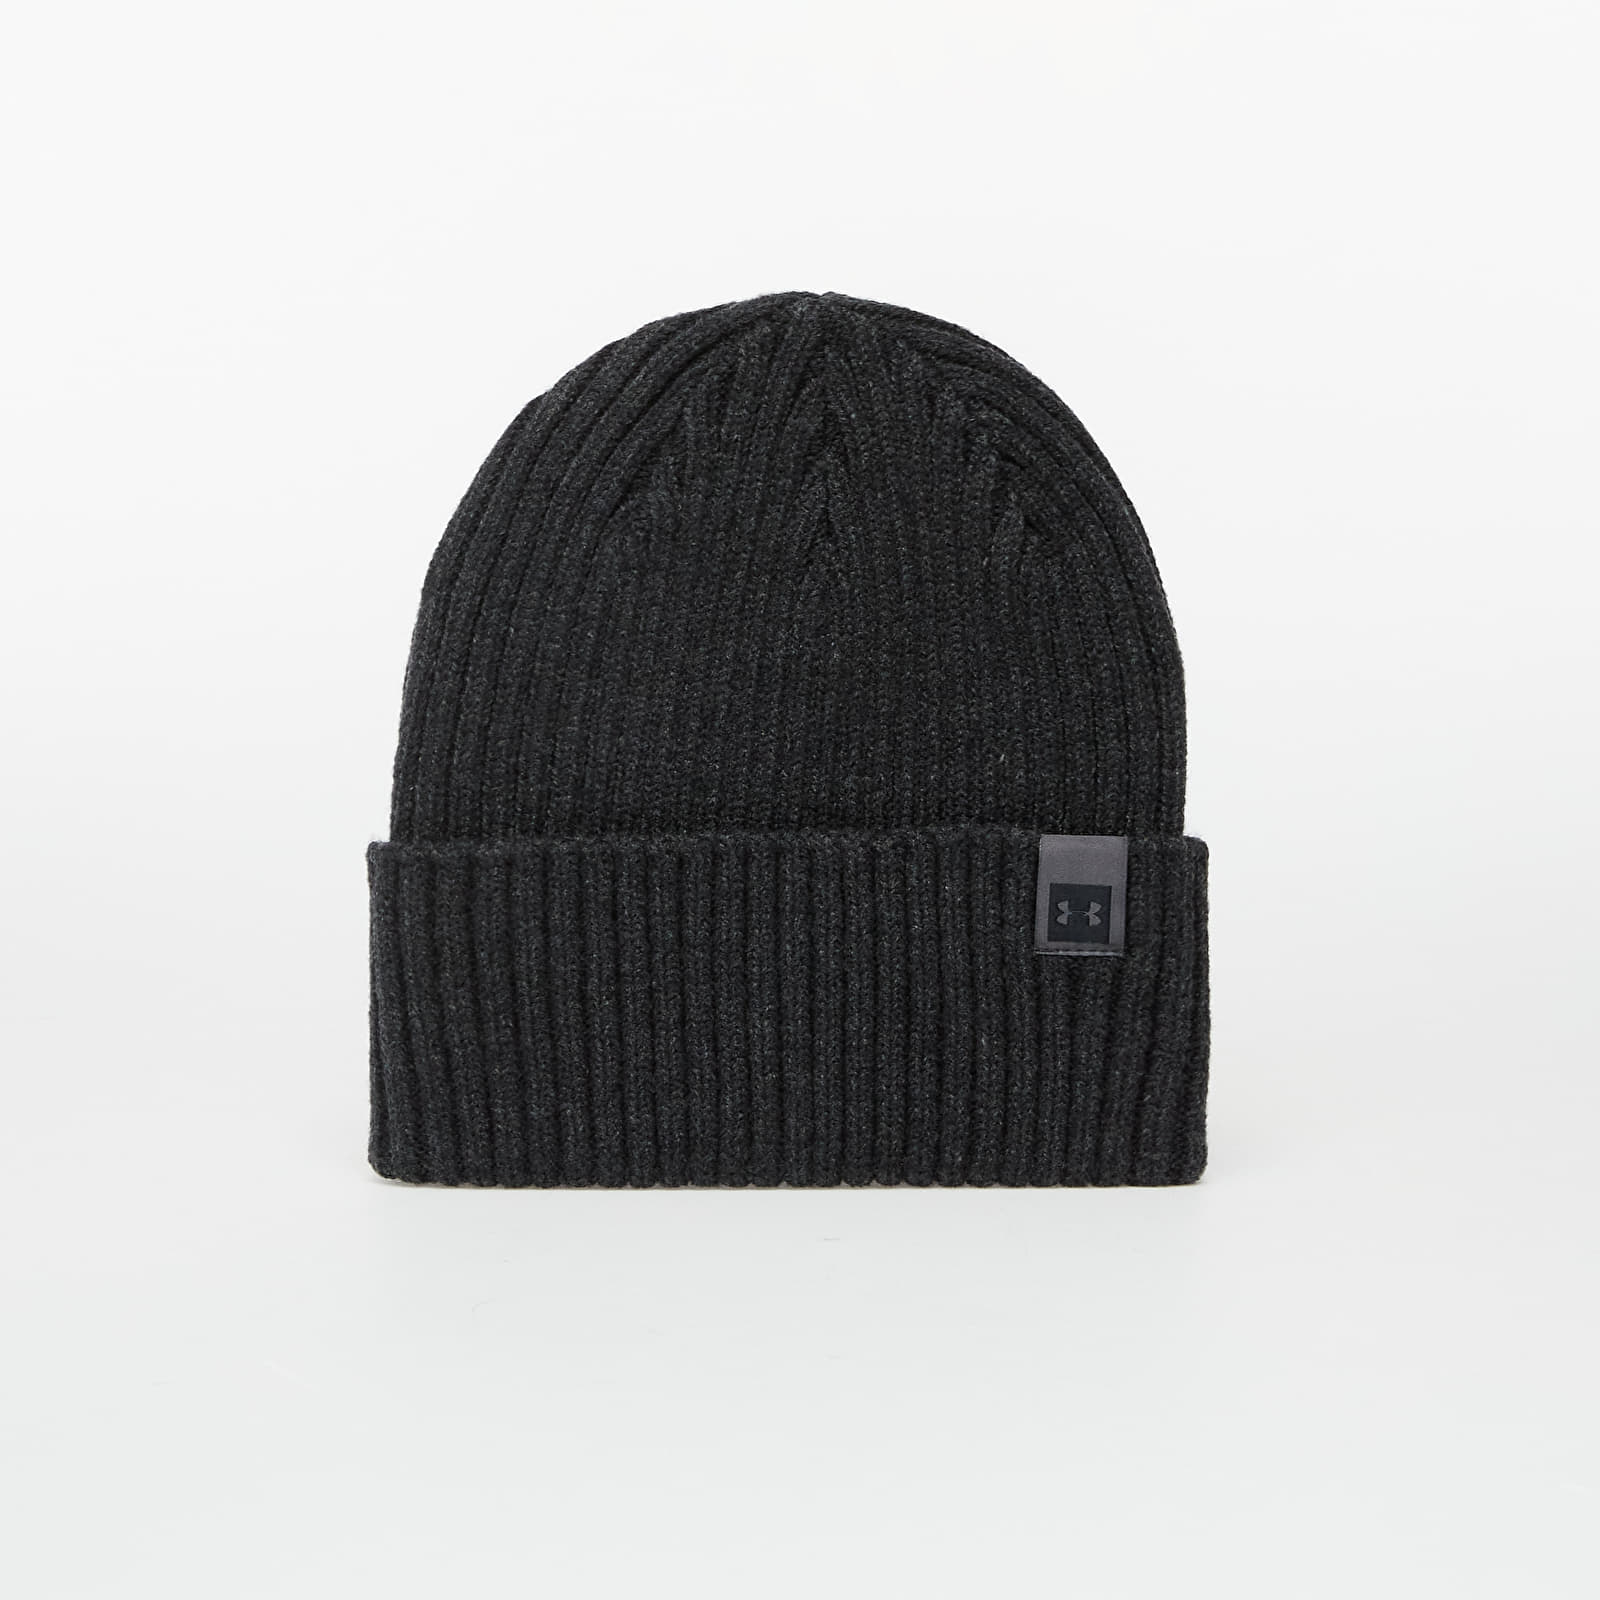 Caps and Hats Under Armour Truckstop Pro Beanie Black Medium Heather/ Black